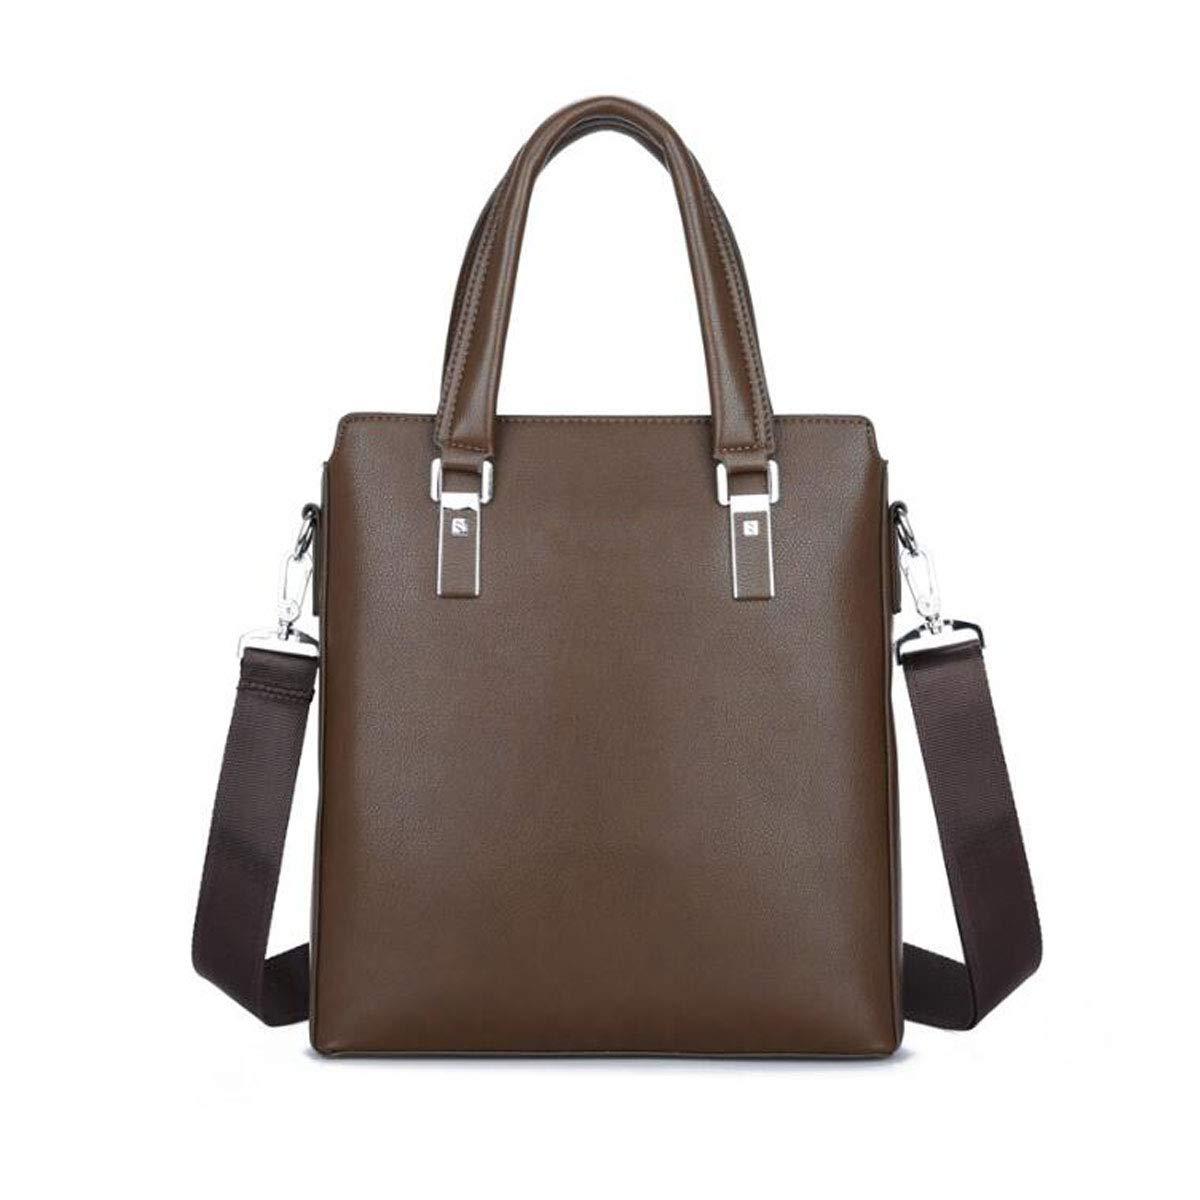 Color : Black Business Shoulder-Slung Computer Bag Size: 29832cm Concise Travel Chenjinxiang Briefcase Mens PU Leather Suitable for Work